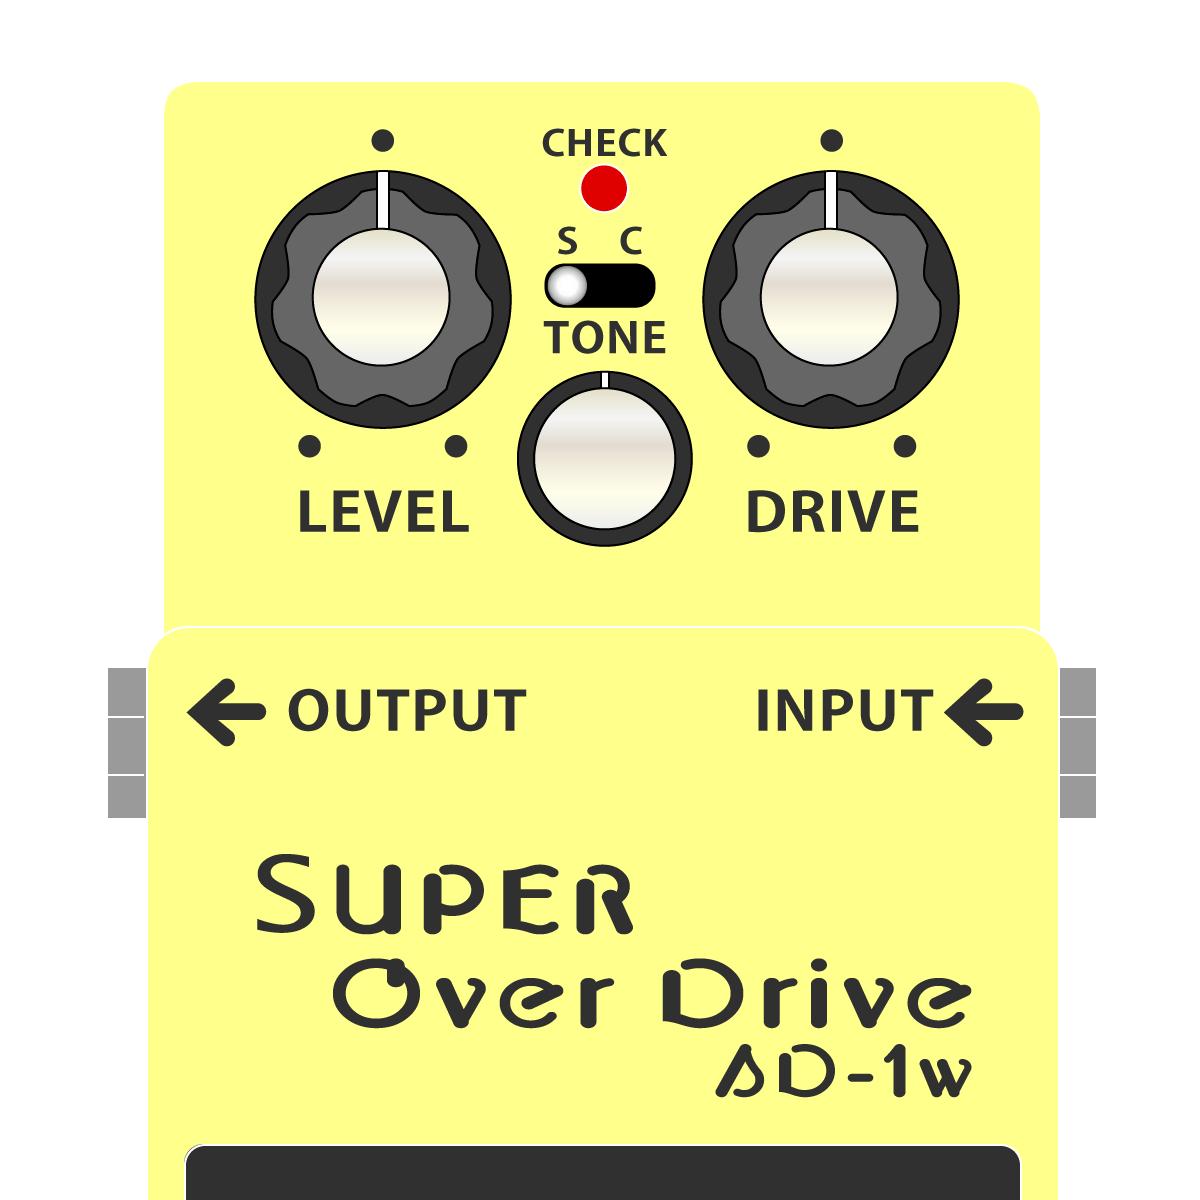 SD-1W SUPER Overdrive WAZA CRAFT(スーパーオーバードライブ・技クラフト)